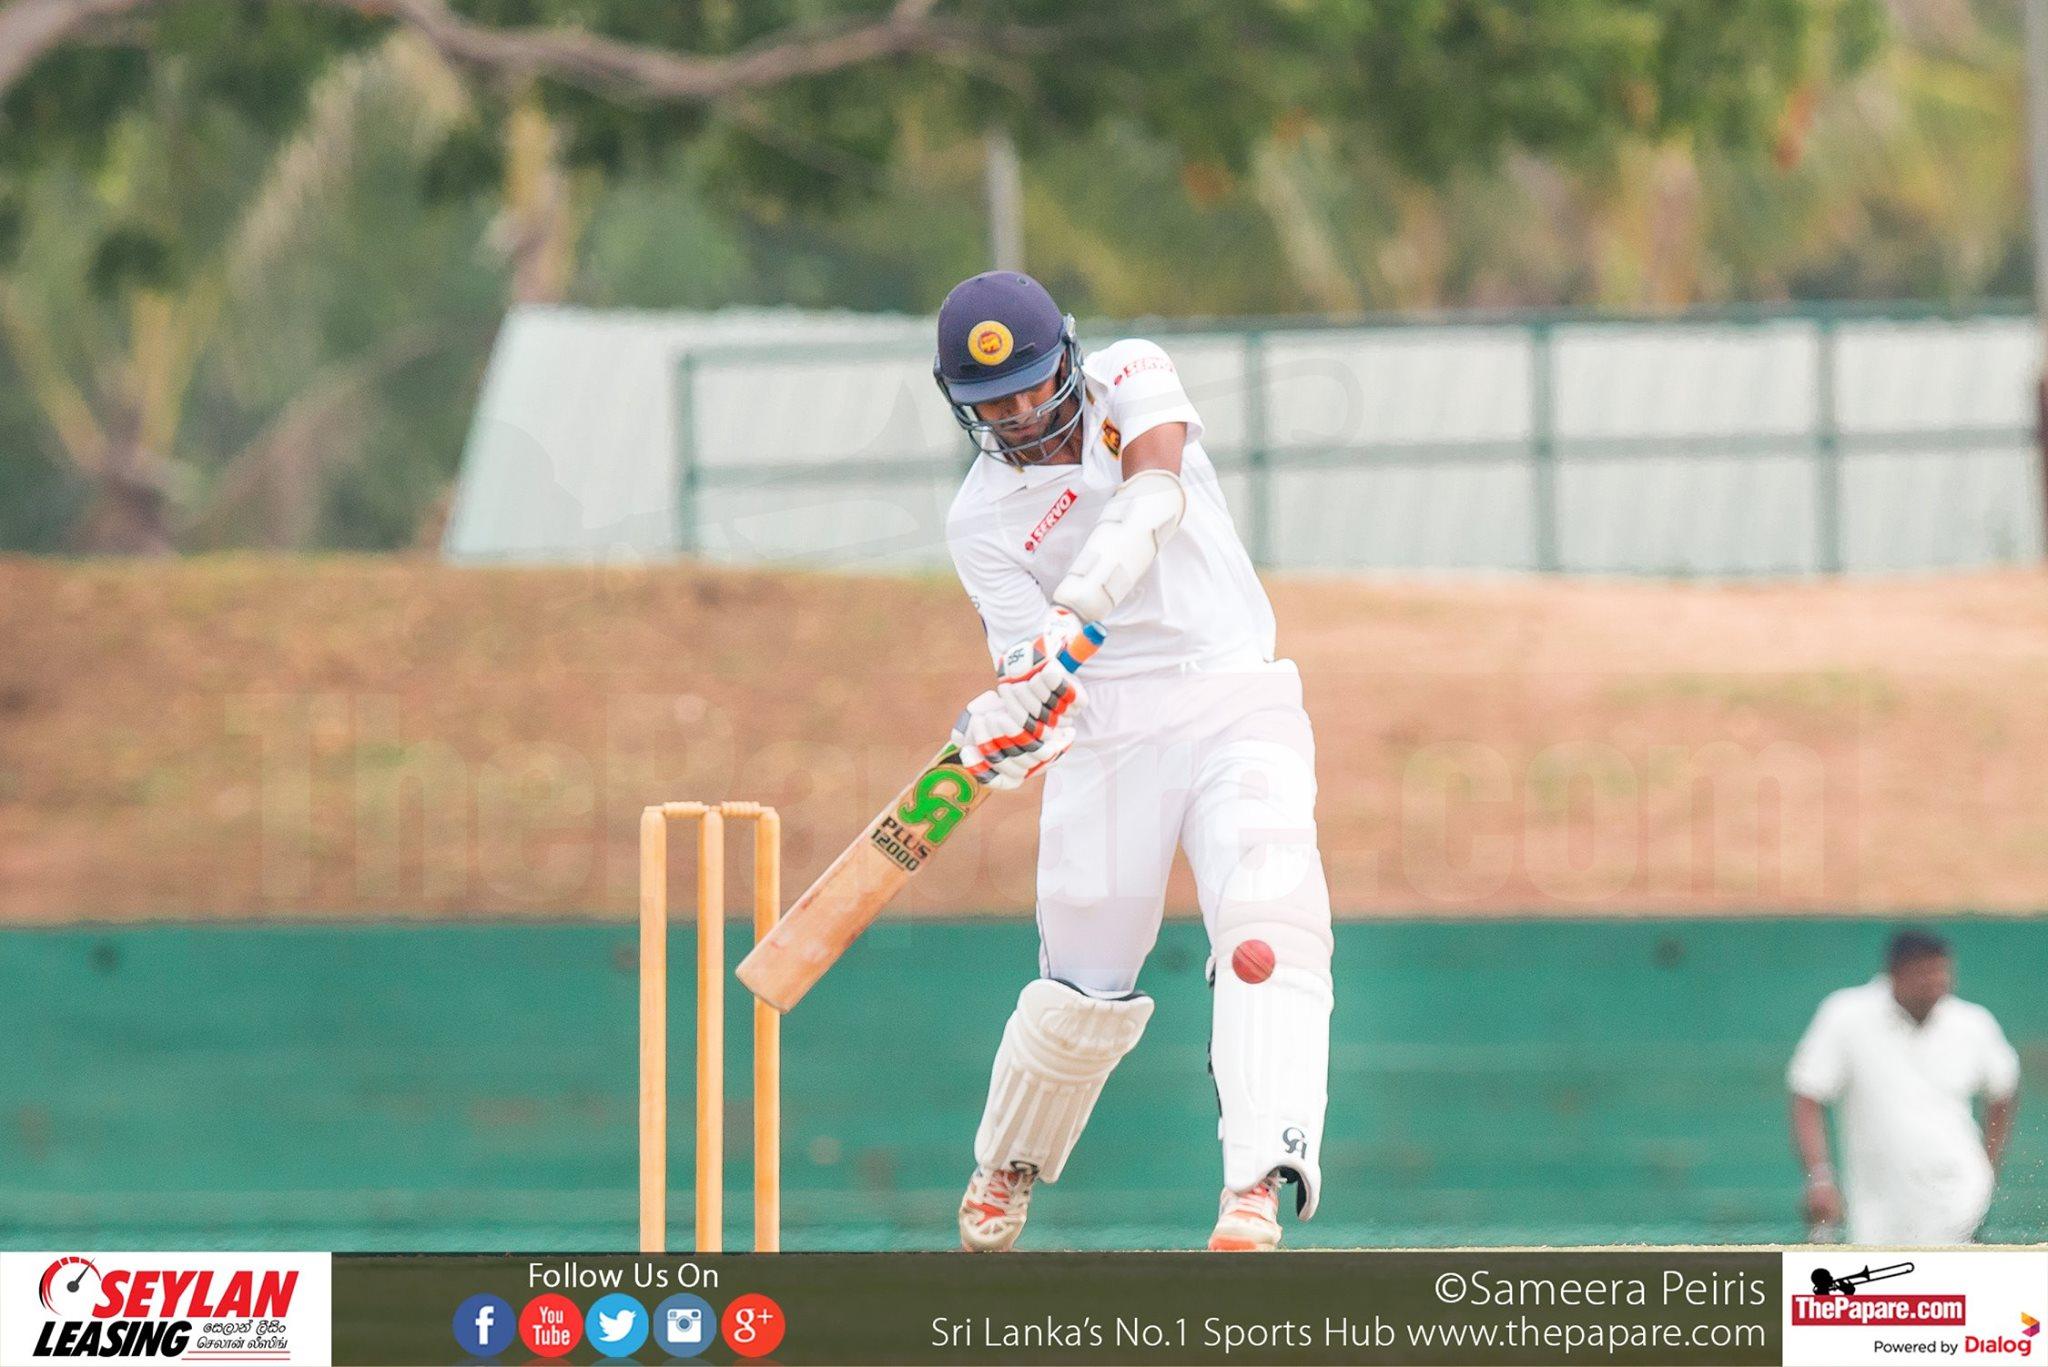 Sri Lanka 'A' vs West Indies 'A' - 3rd Test (Day 04)